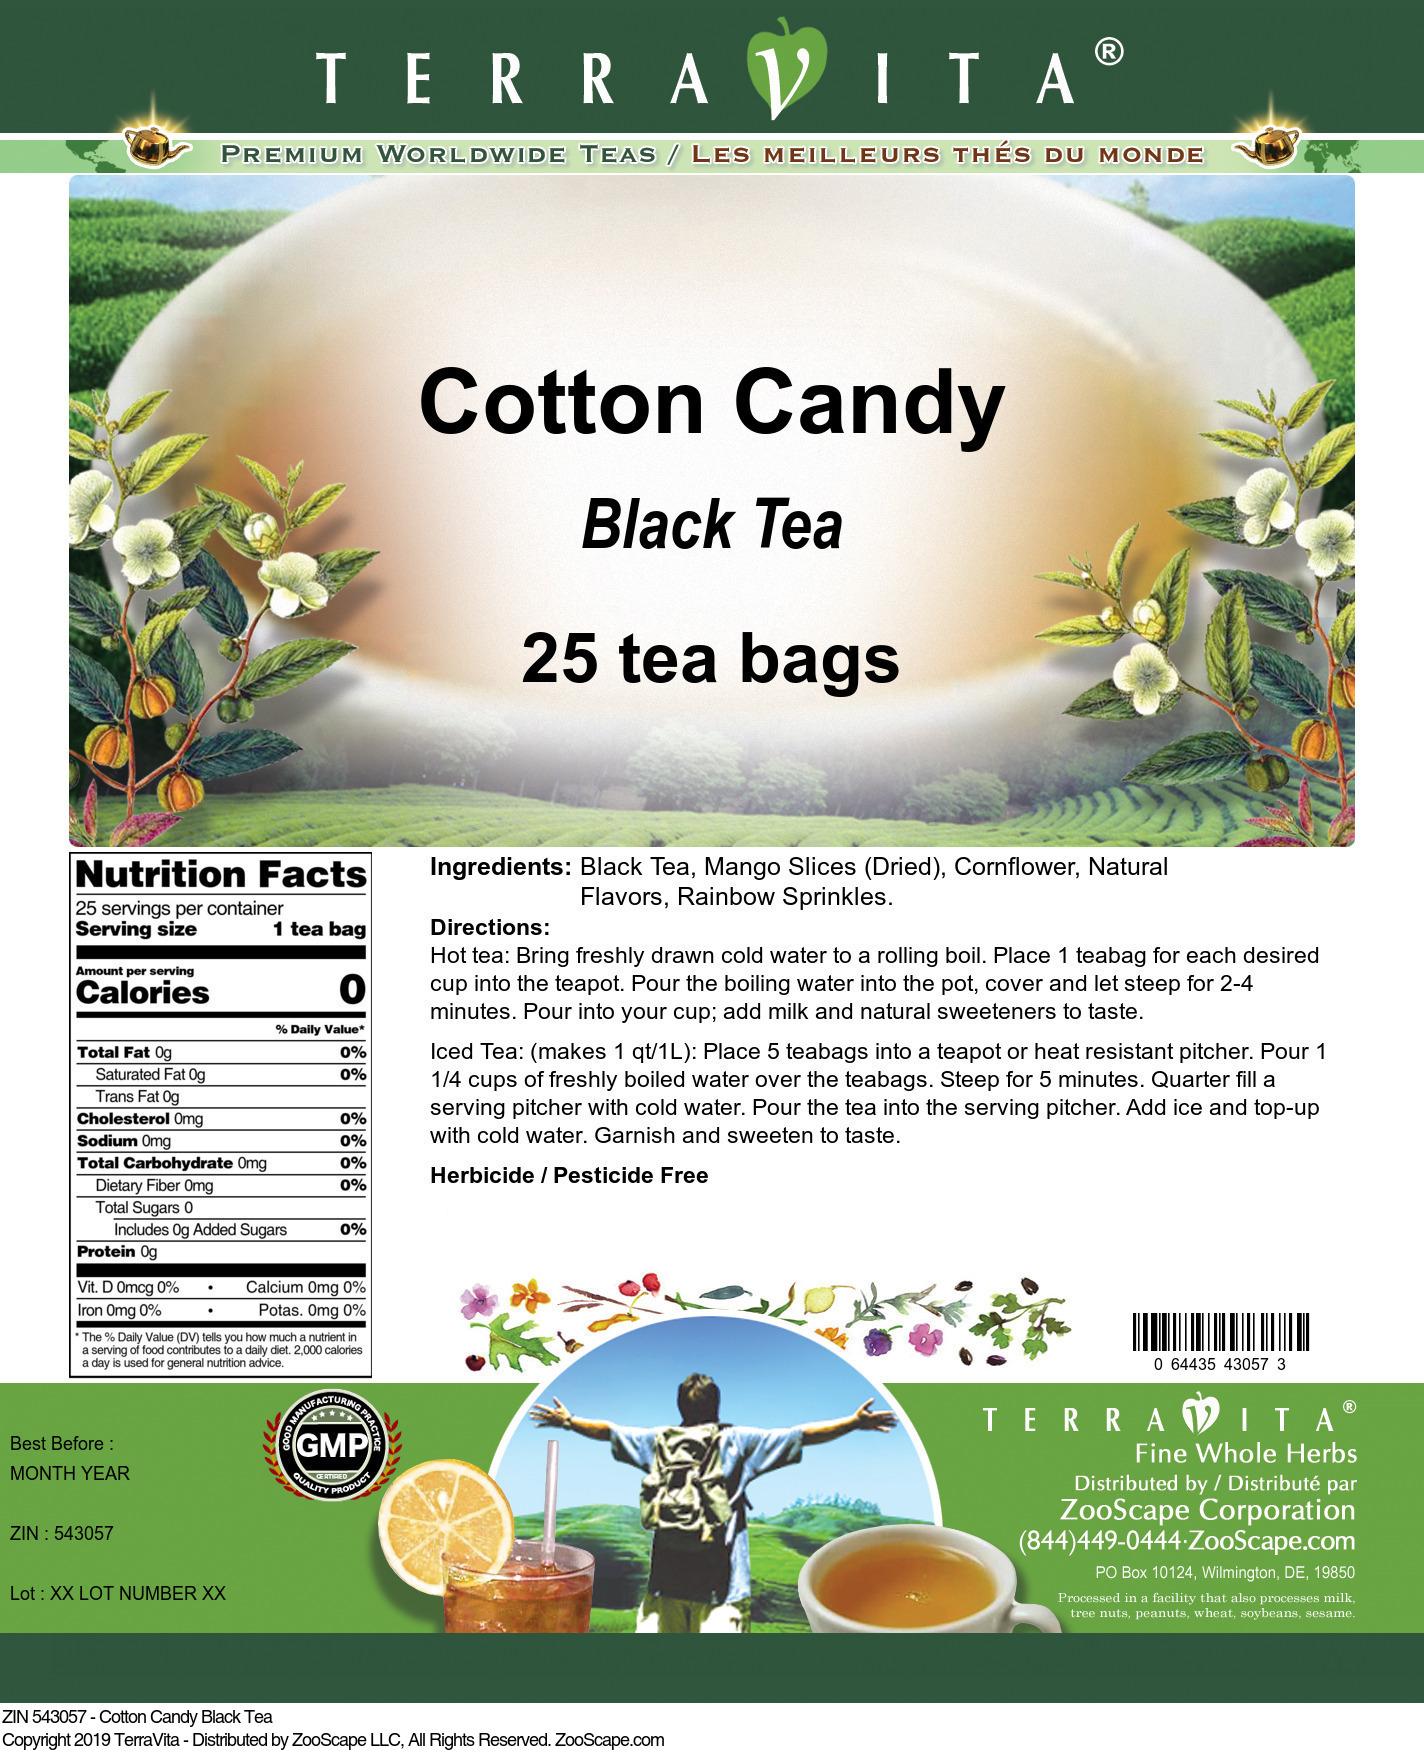 Cotton Candy Black Tea